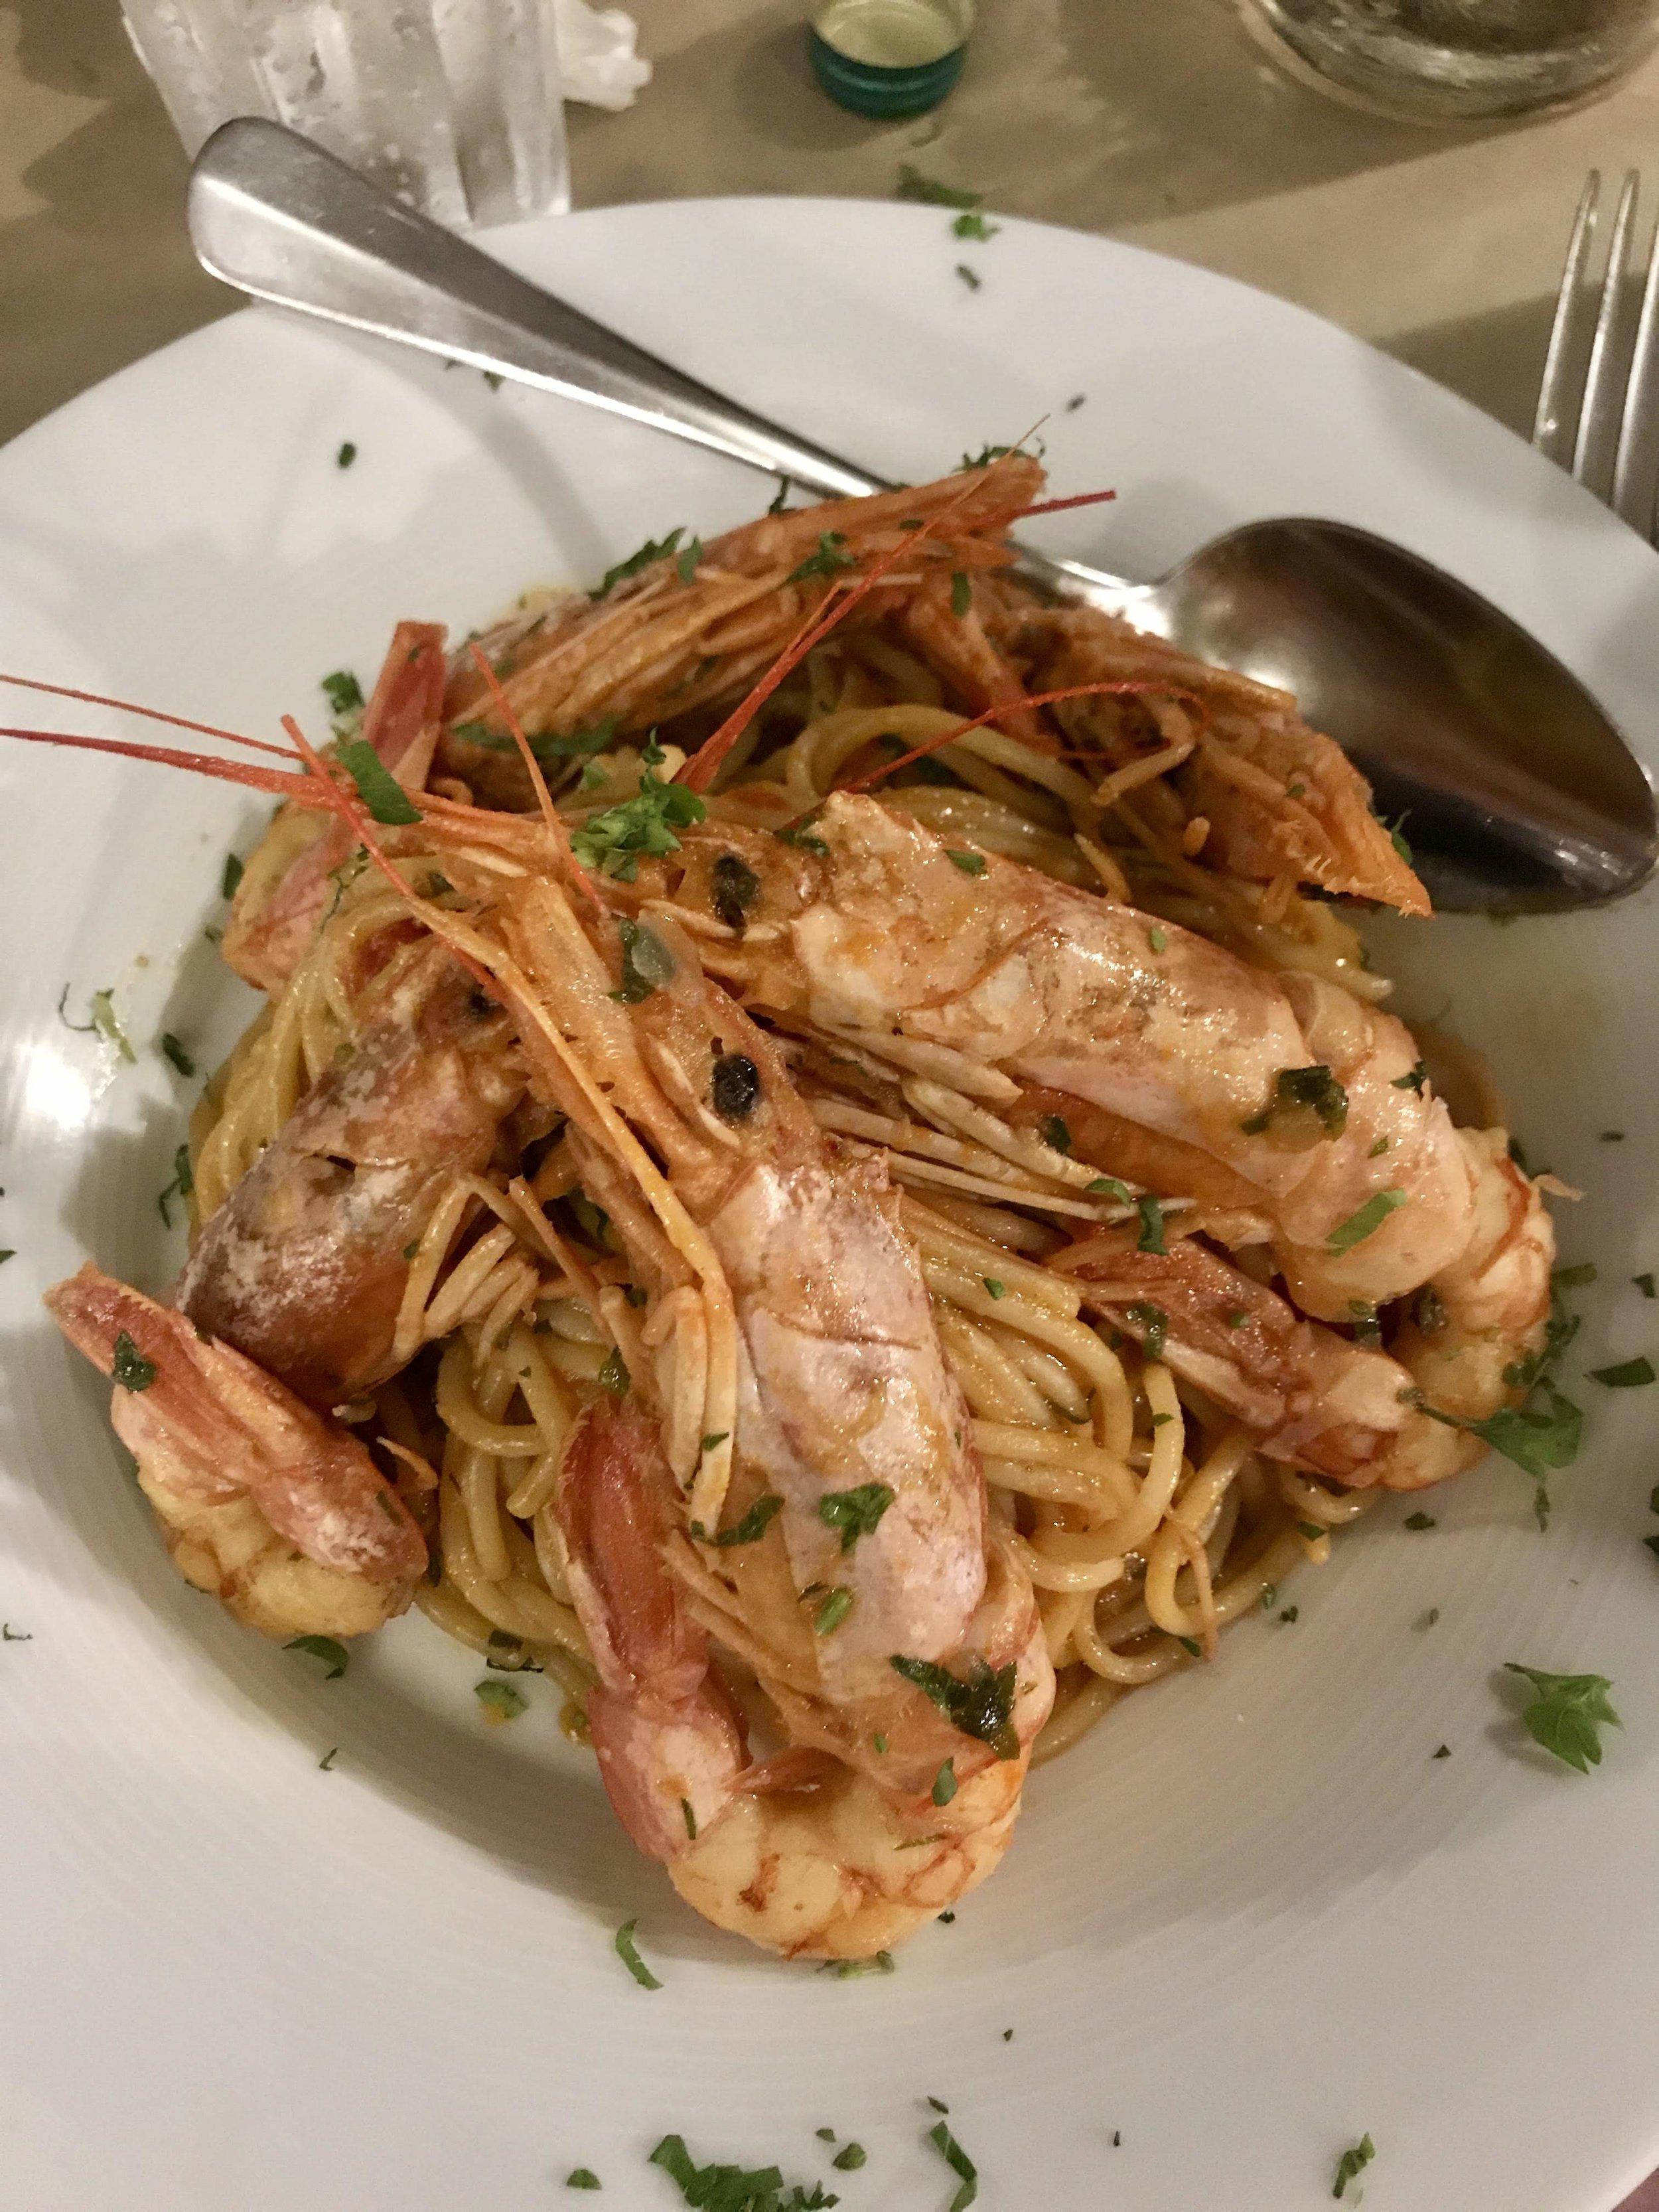 My amazing last dinner: shrimp spaghetti.